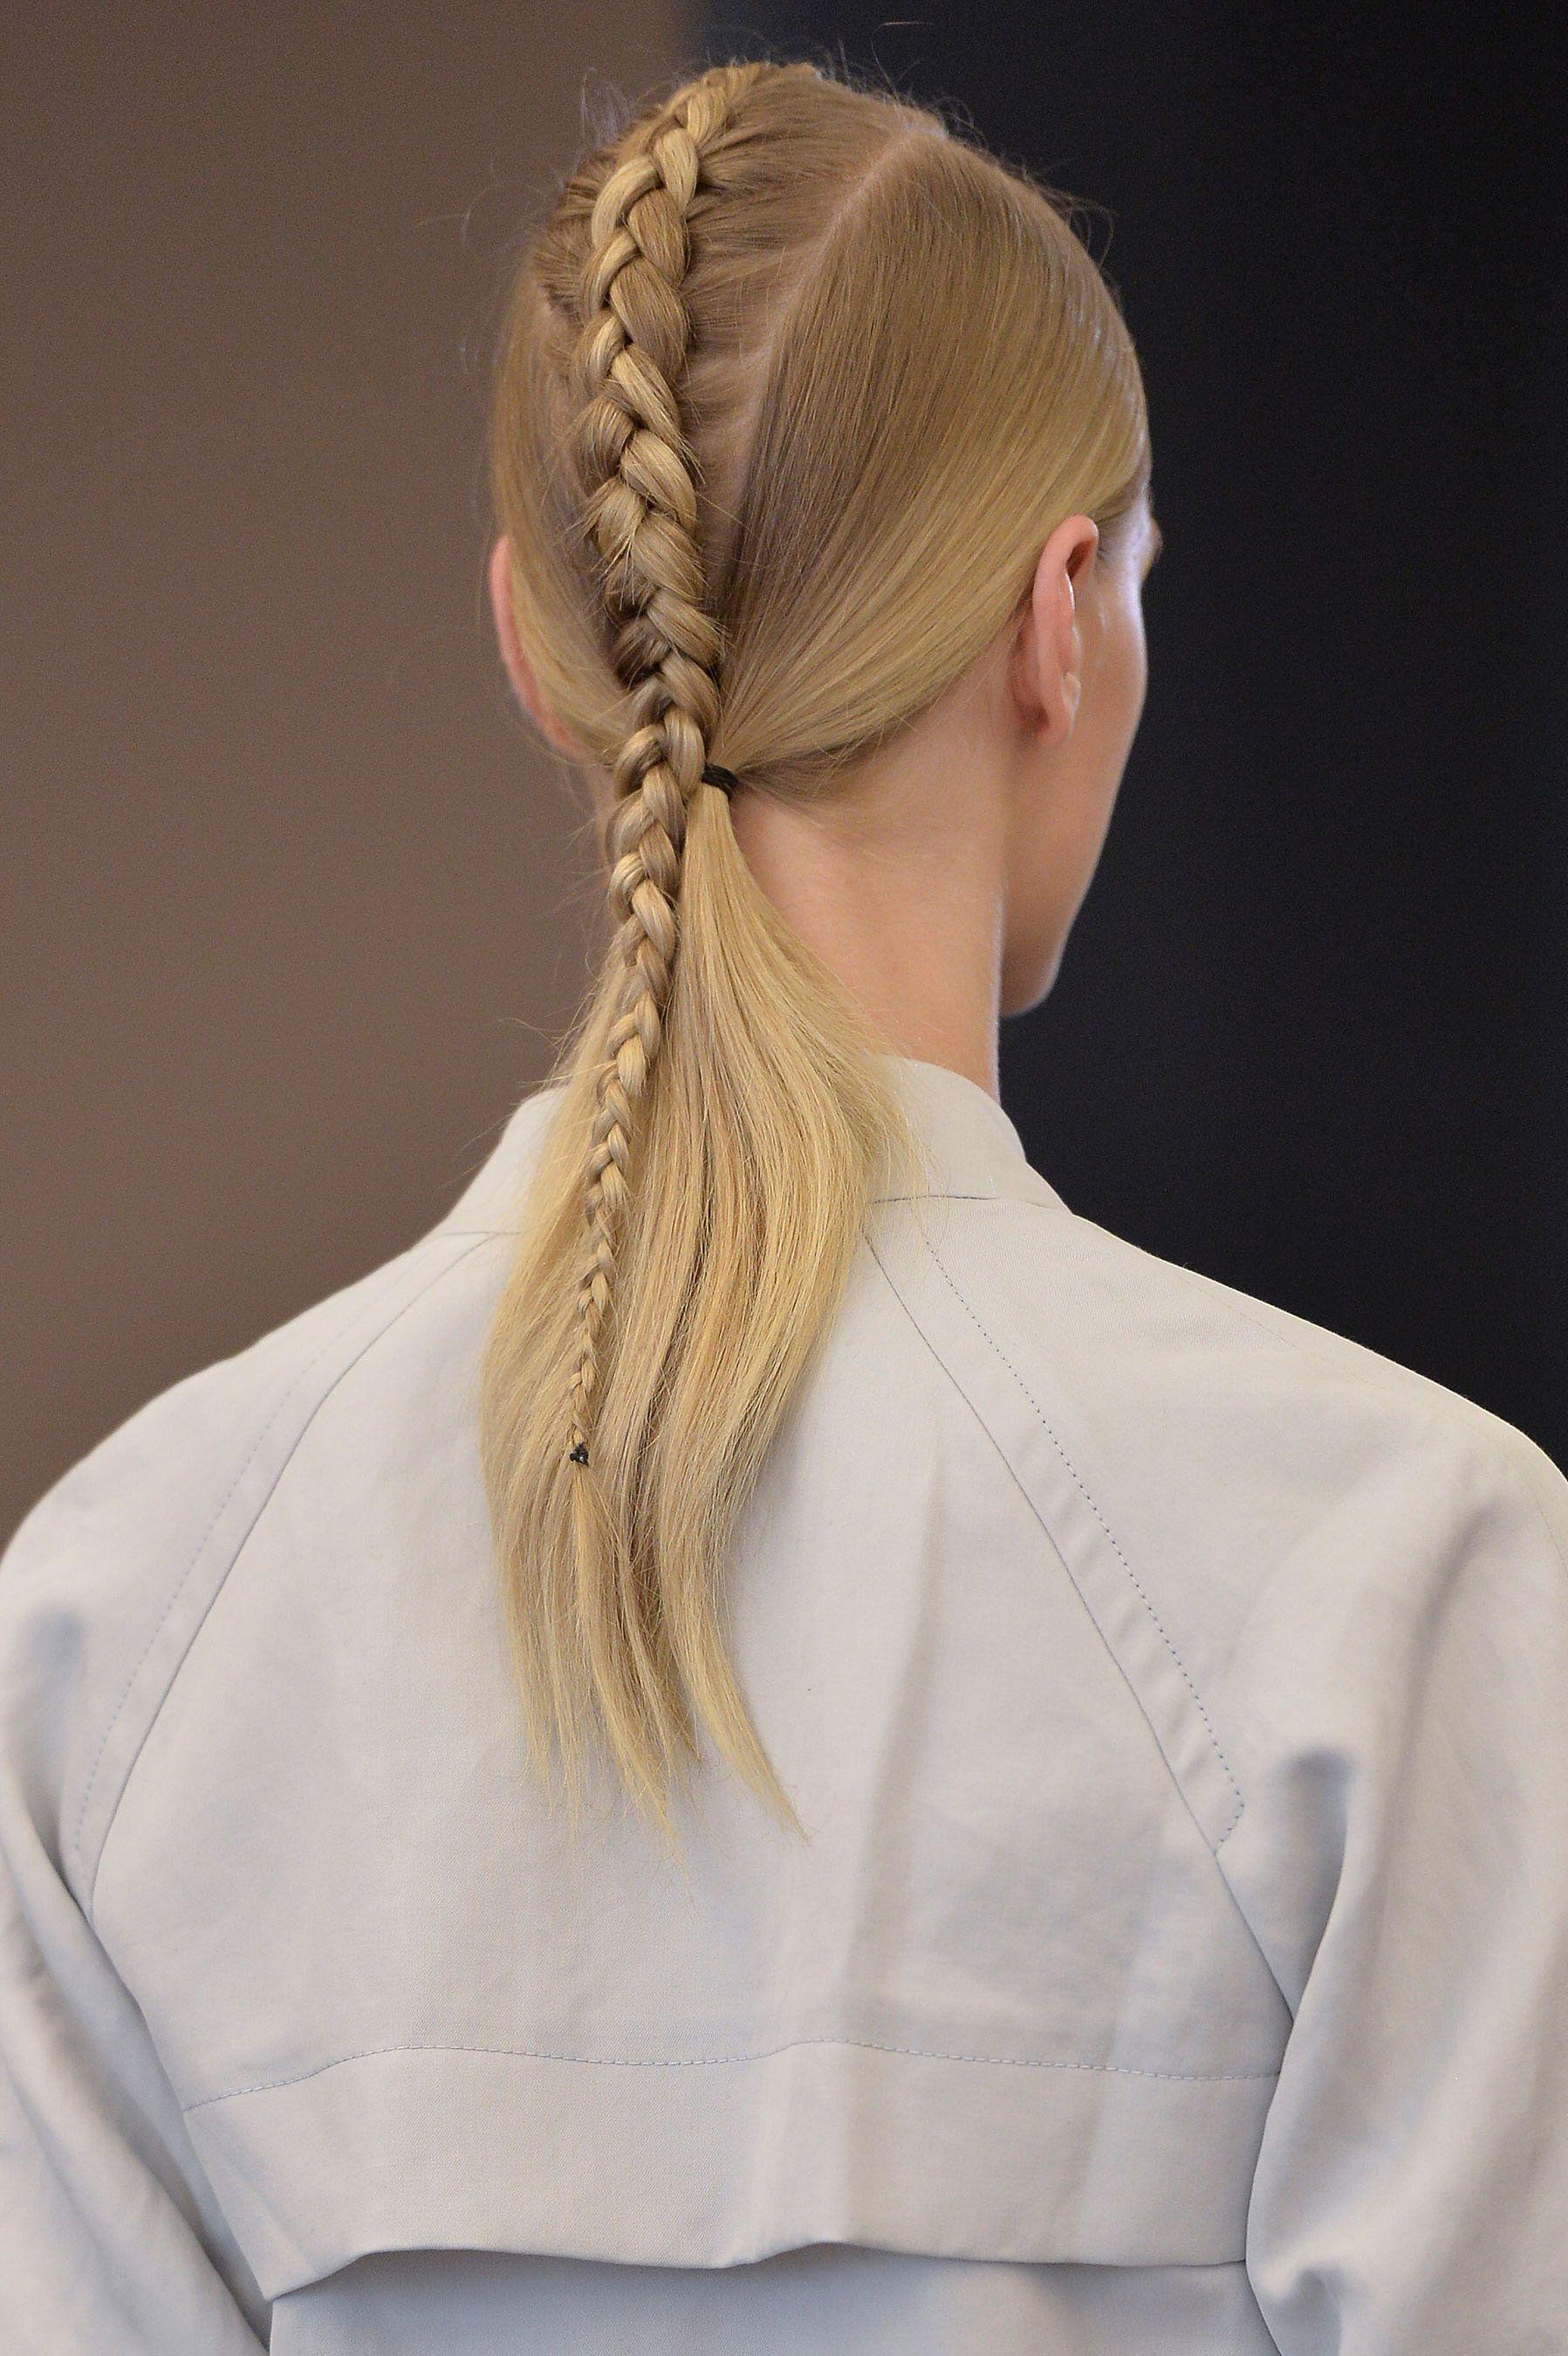 Victor alfaro spring ponytail hair inspiration and hair inspo